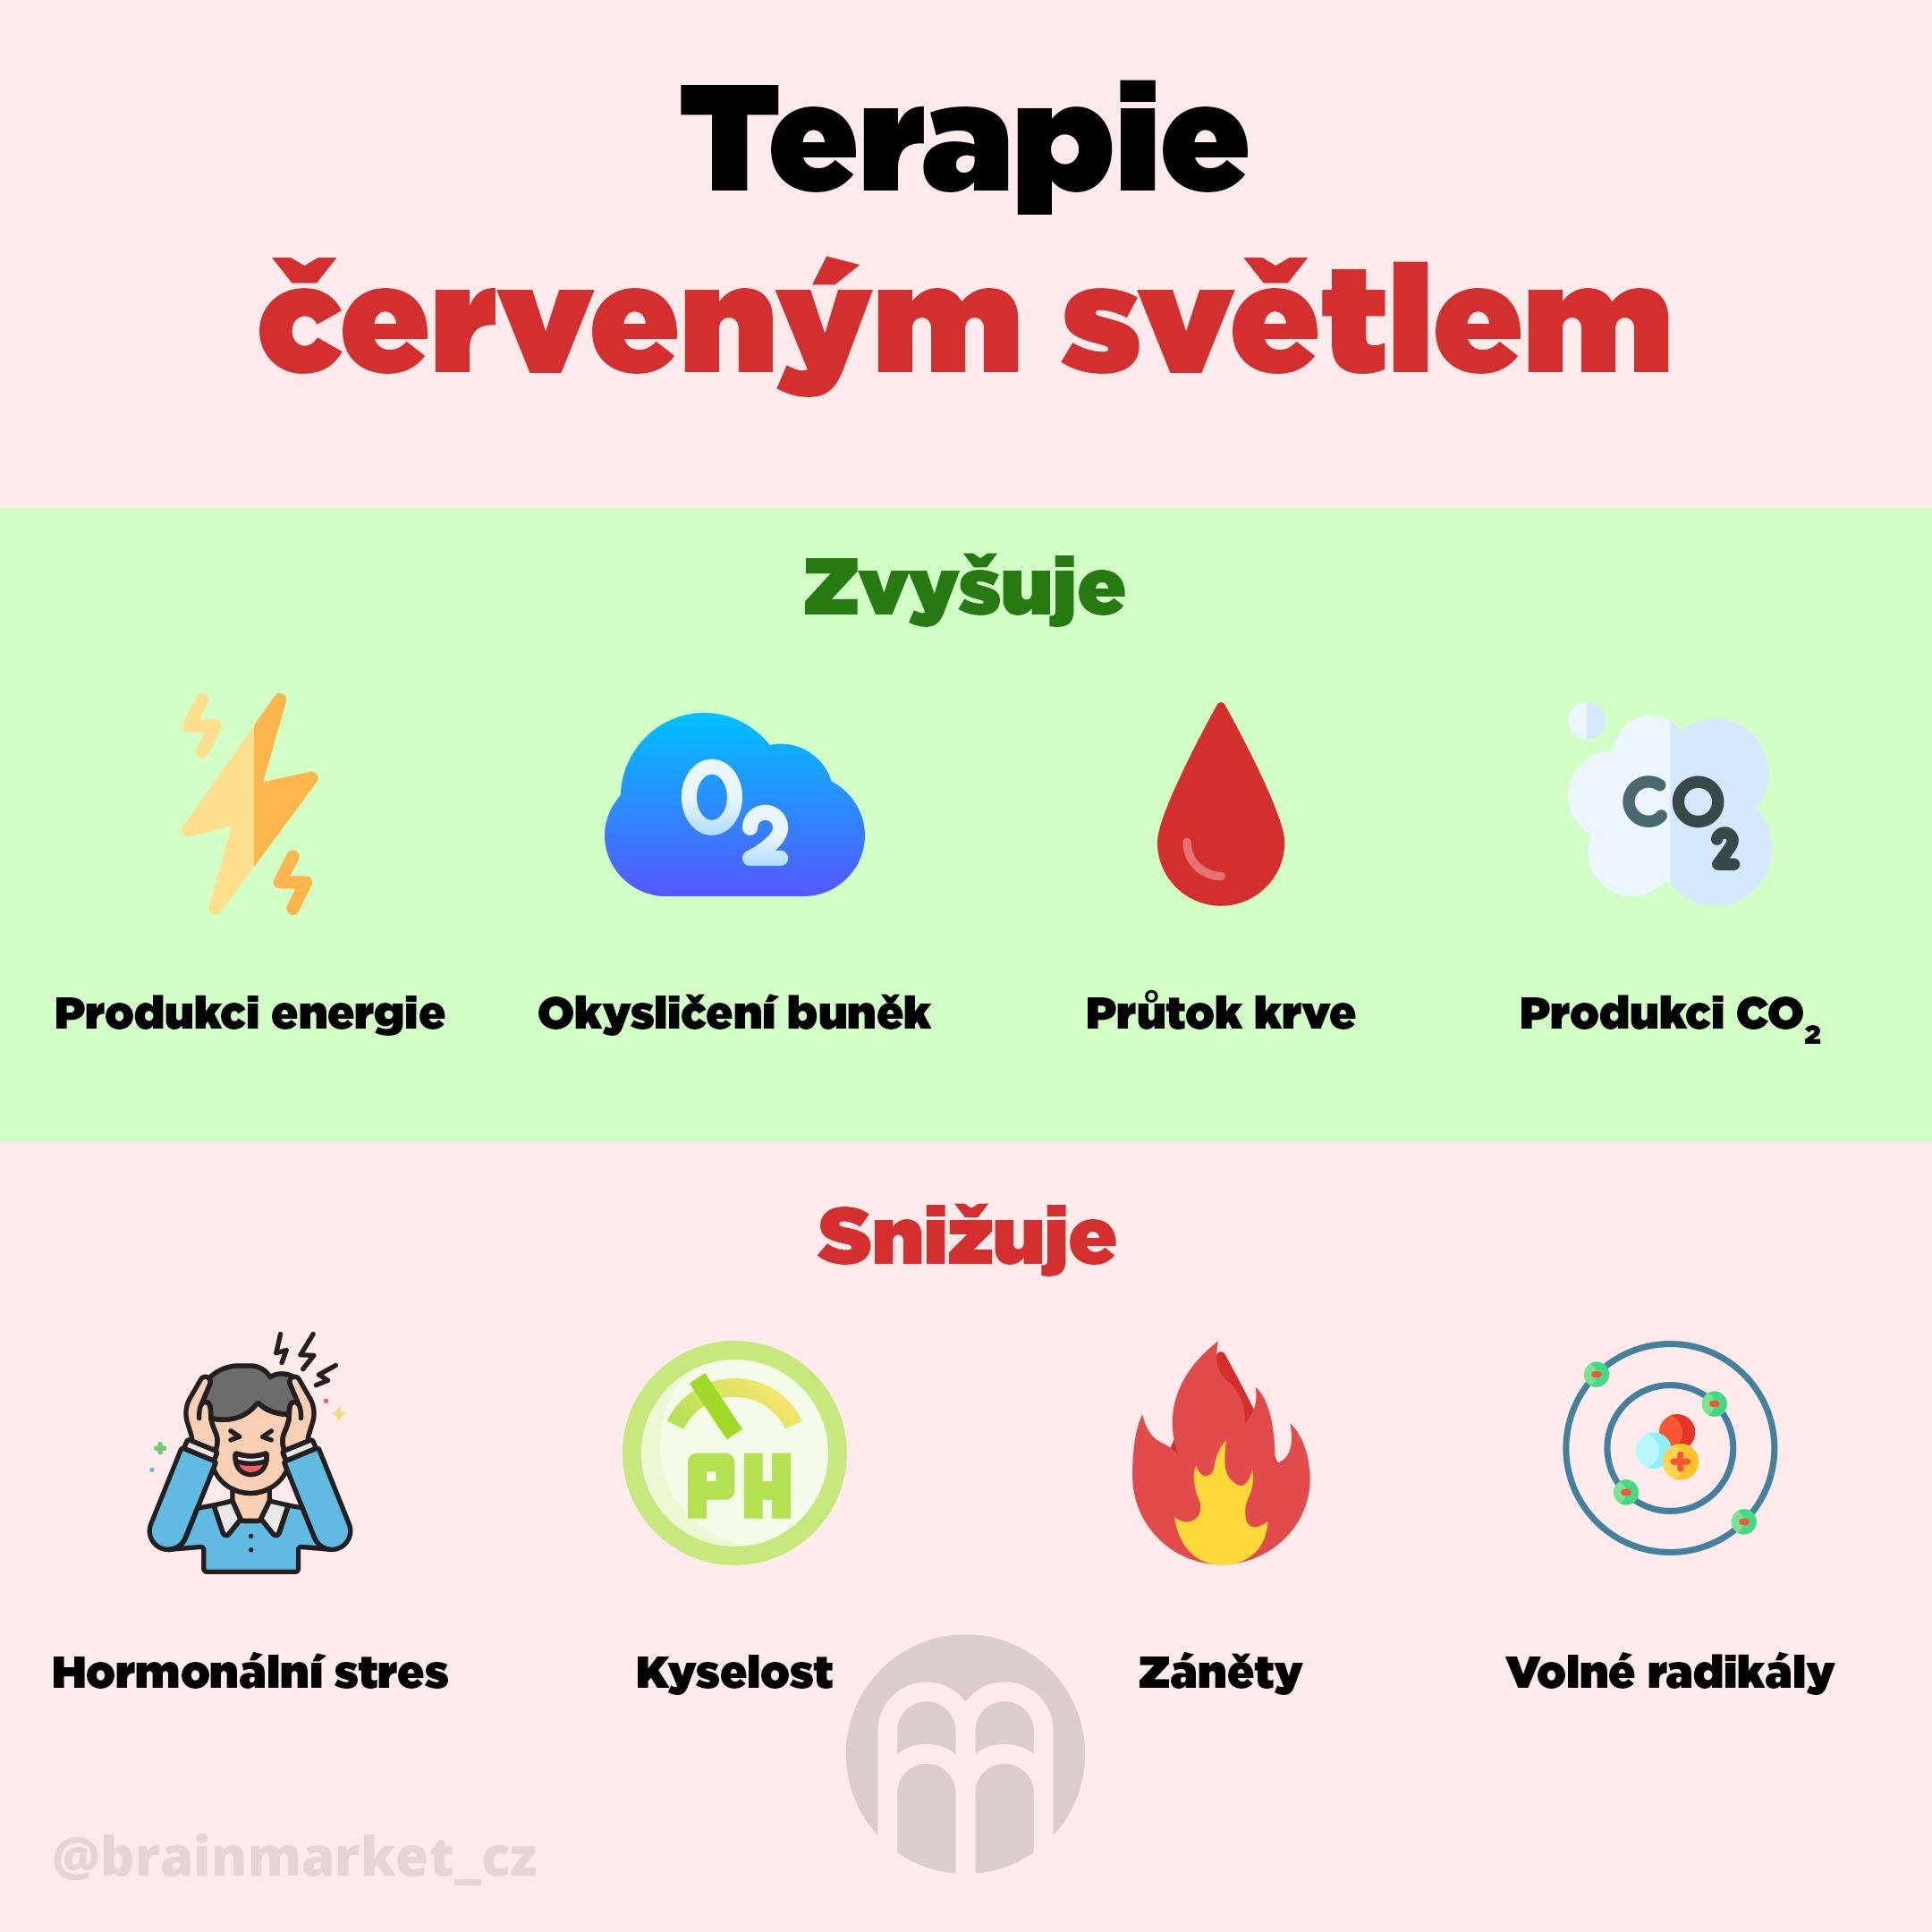 terapie-cervenym-svetlem-infografika-brainmarket-cz